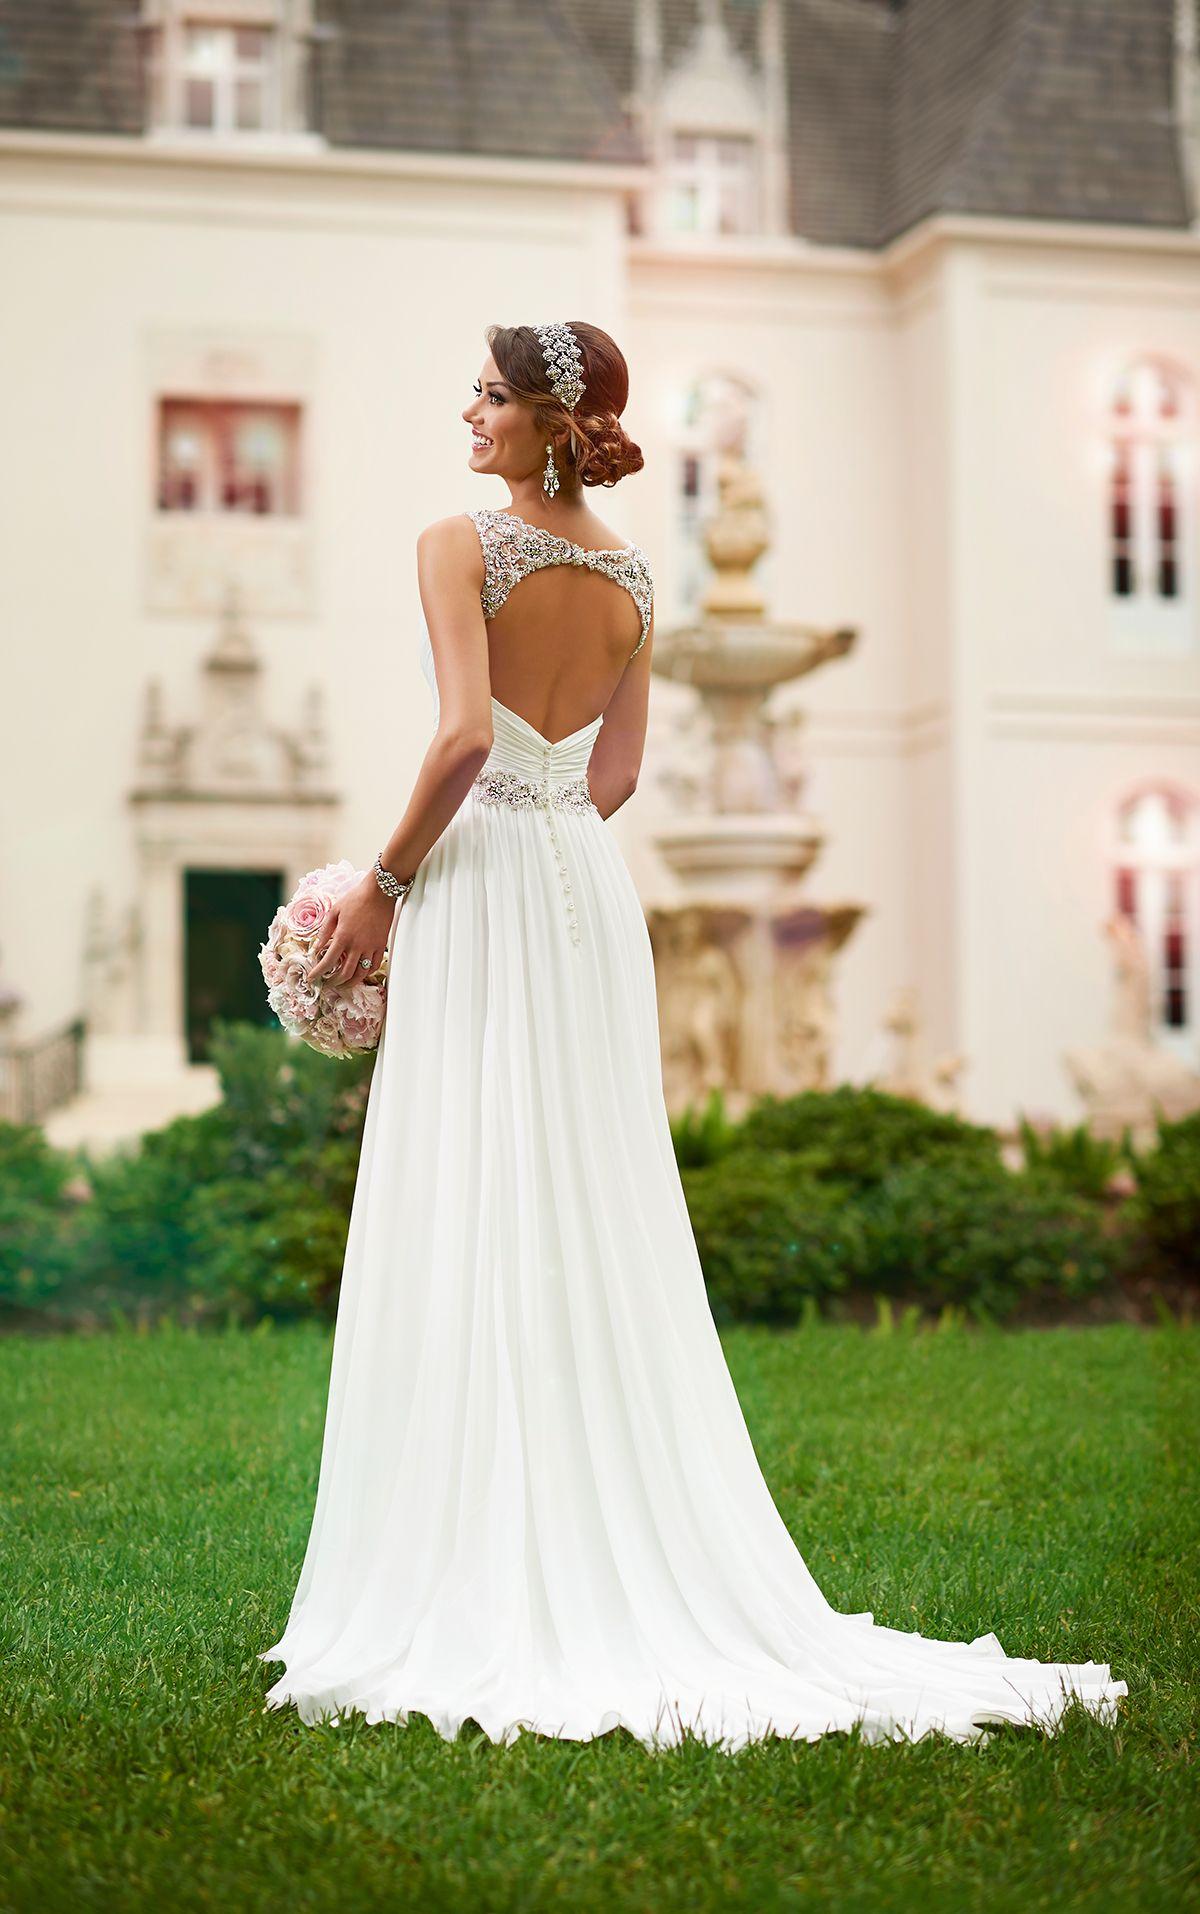 Chiffon Beach Wedding Dress From Stella York Crystal Wedding Dresses Wedding Dresses Chiffon Wedding Gowns [ 1914 x 1200 Pixel ]